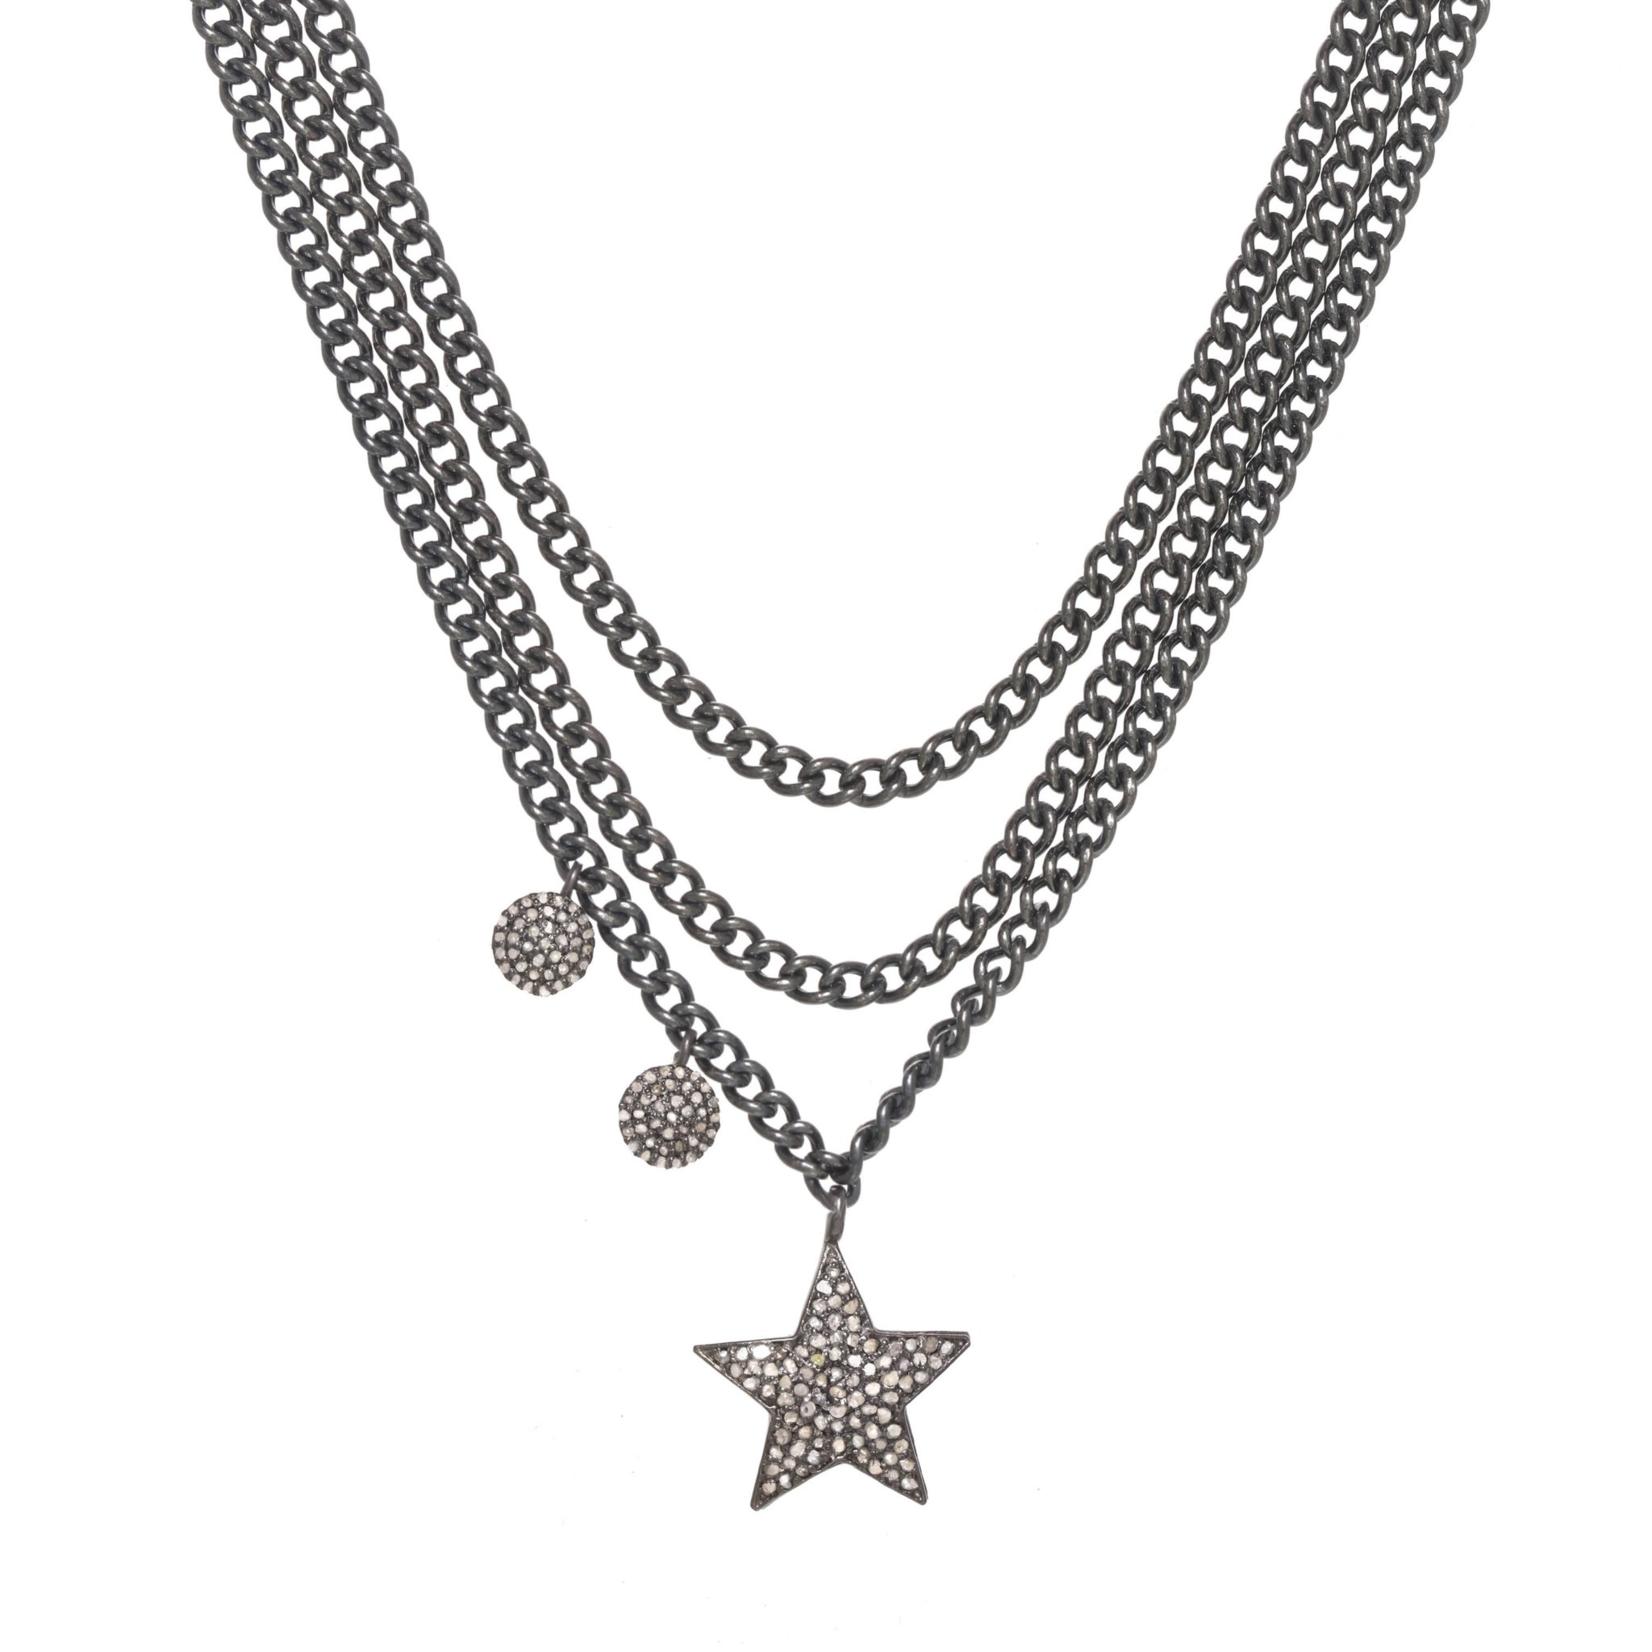 Rachel Reinhardt Star Necklace